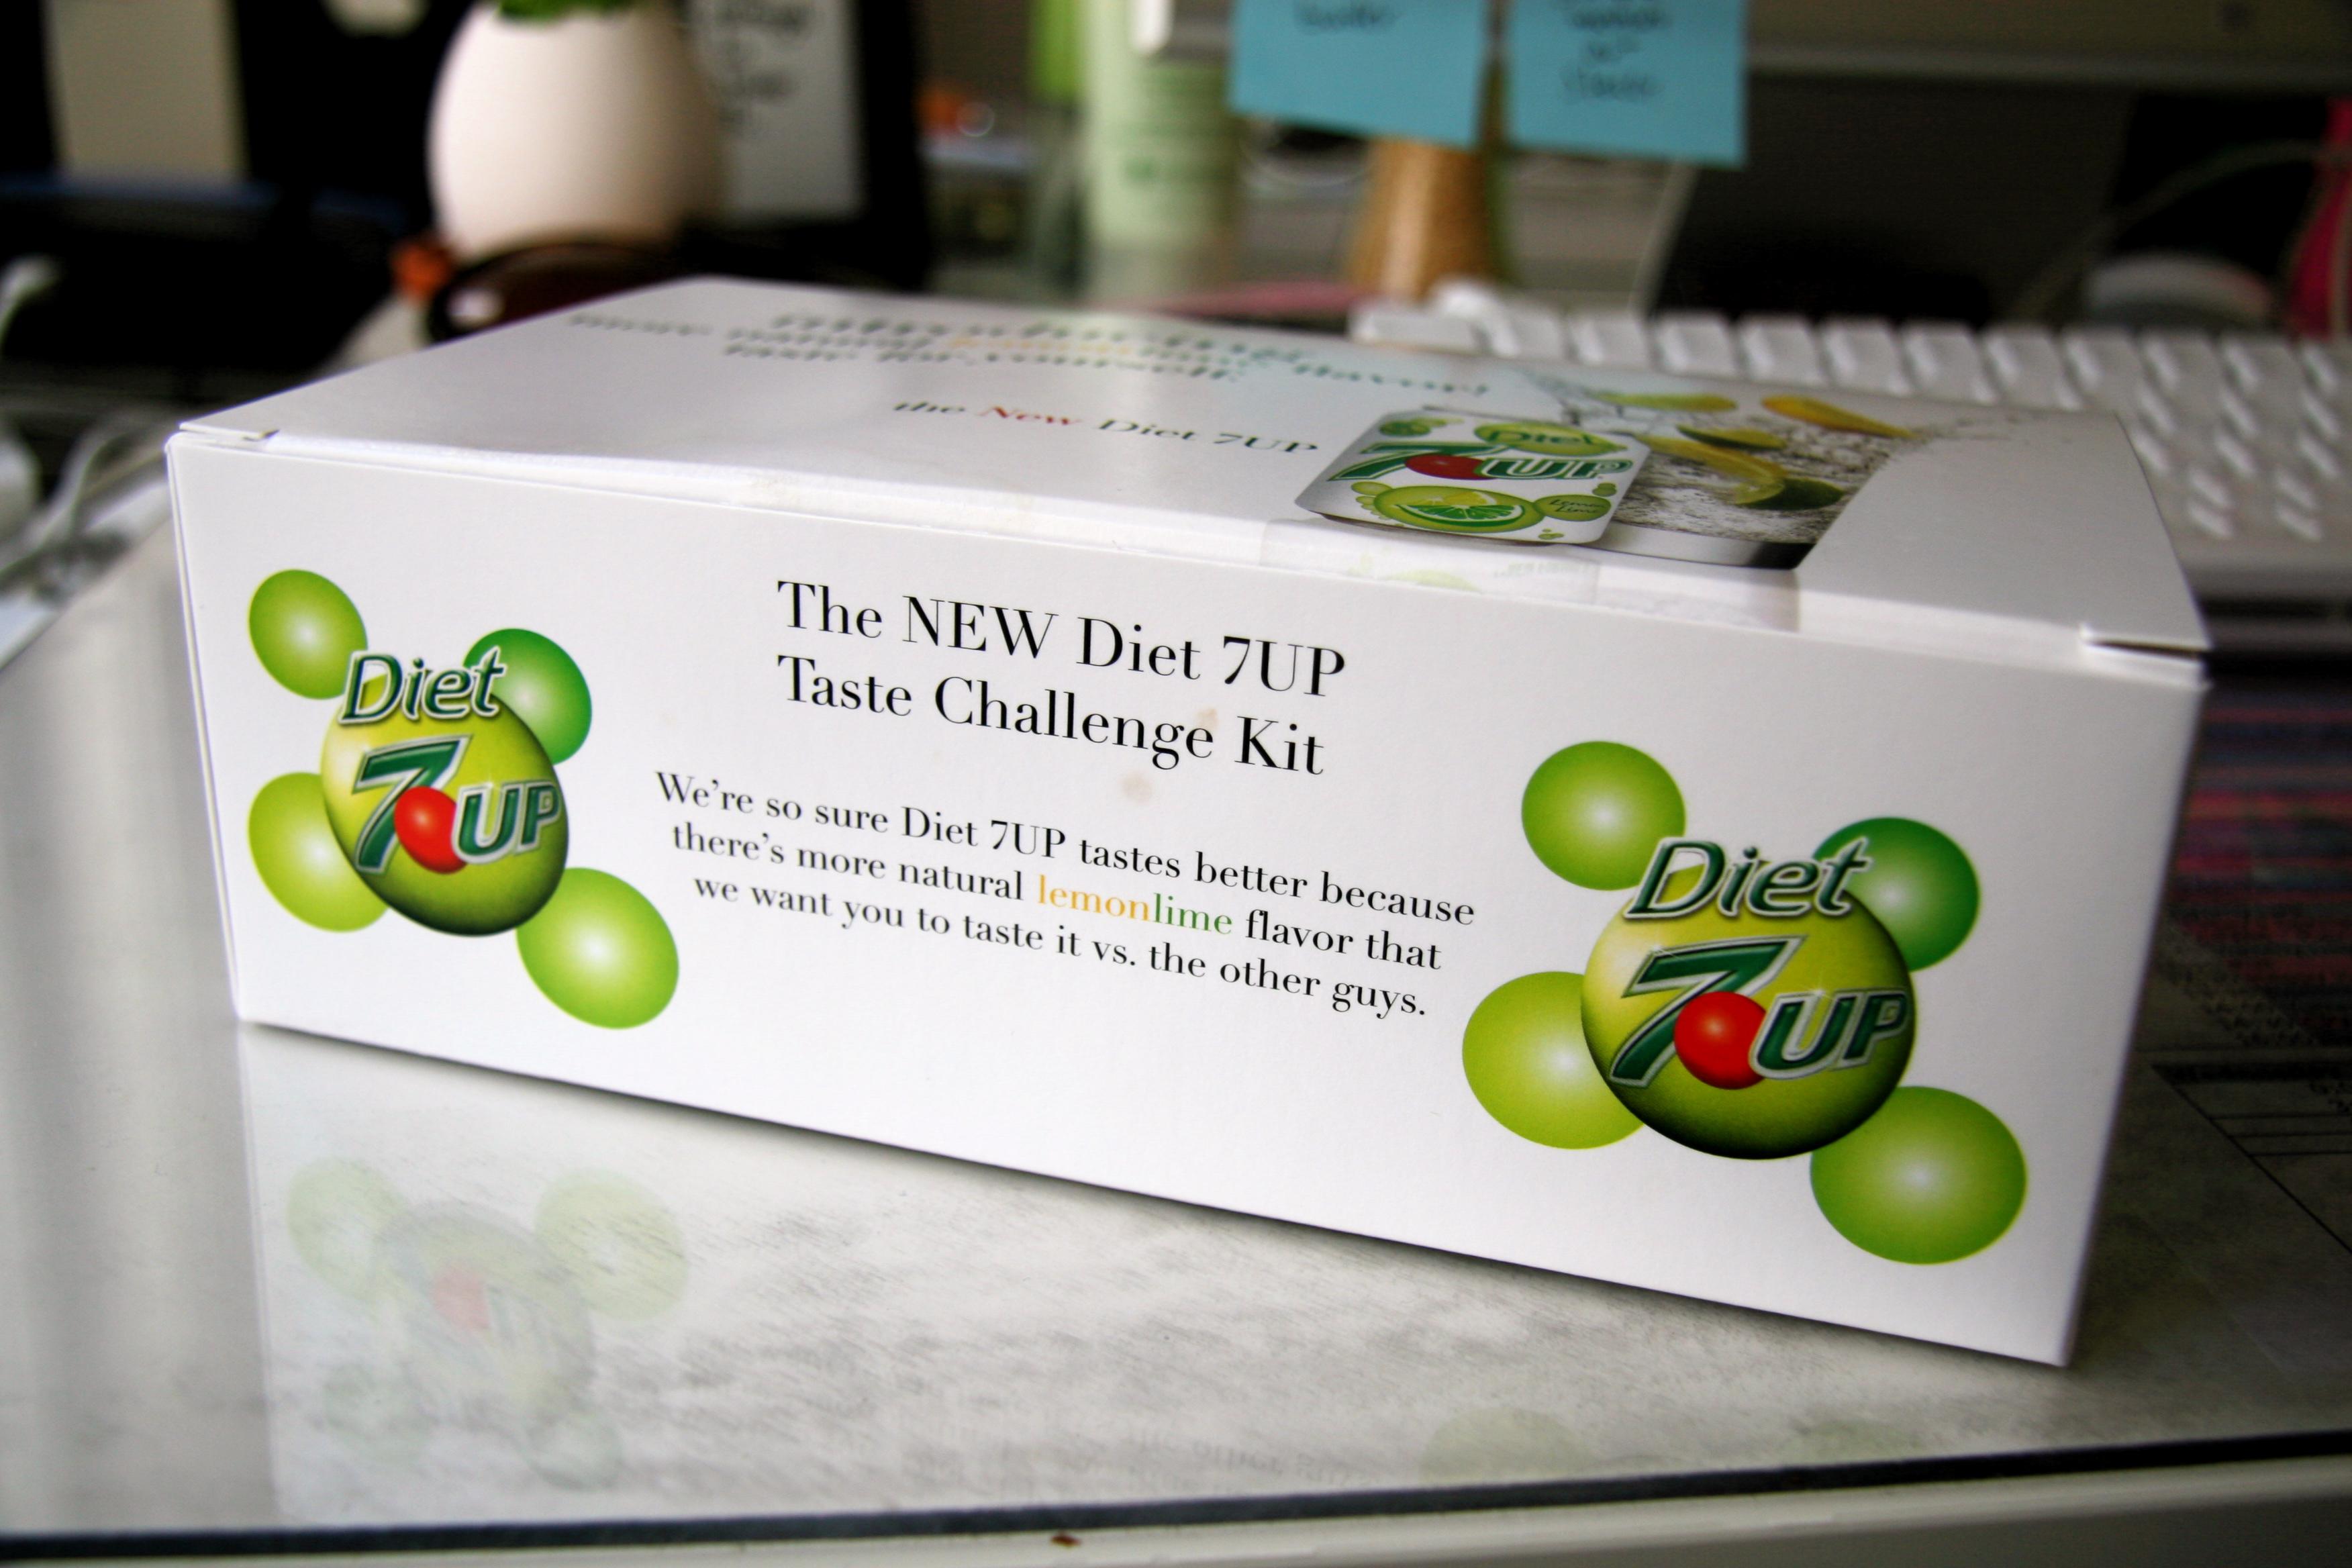 We Take the 7Up Taste Challenge